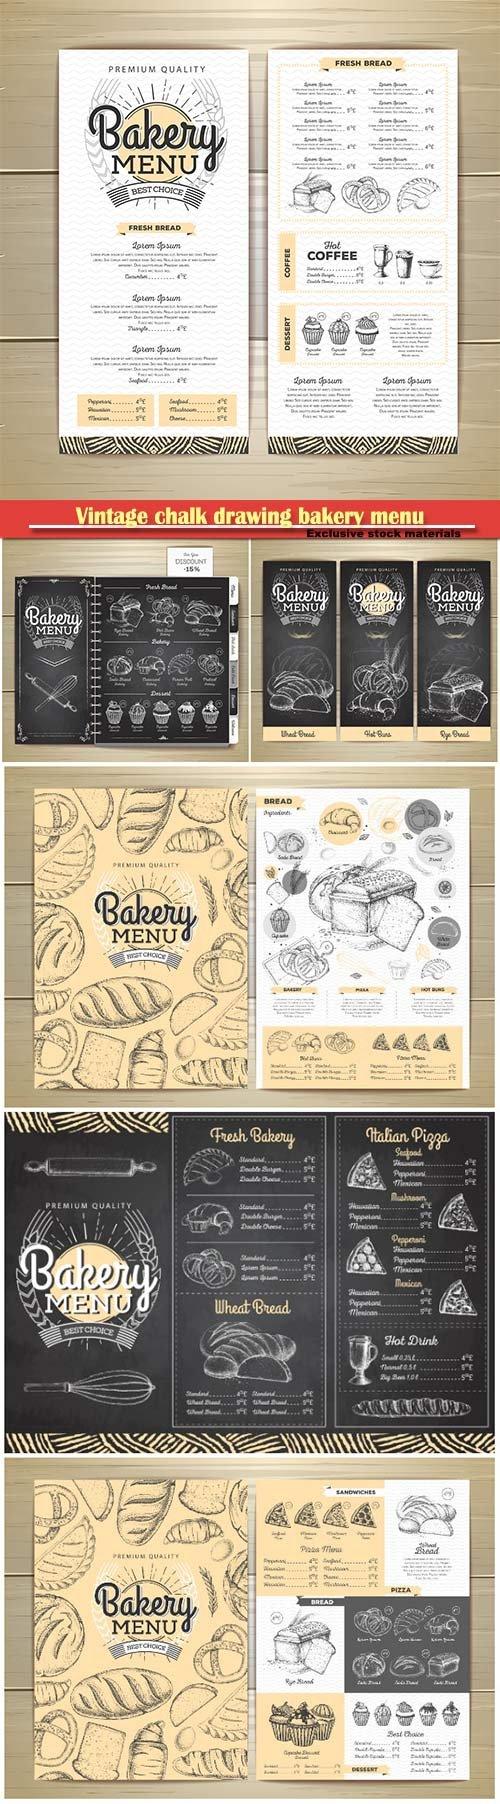 Vintage chalk drawing bakery menu design, restaurant menu